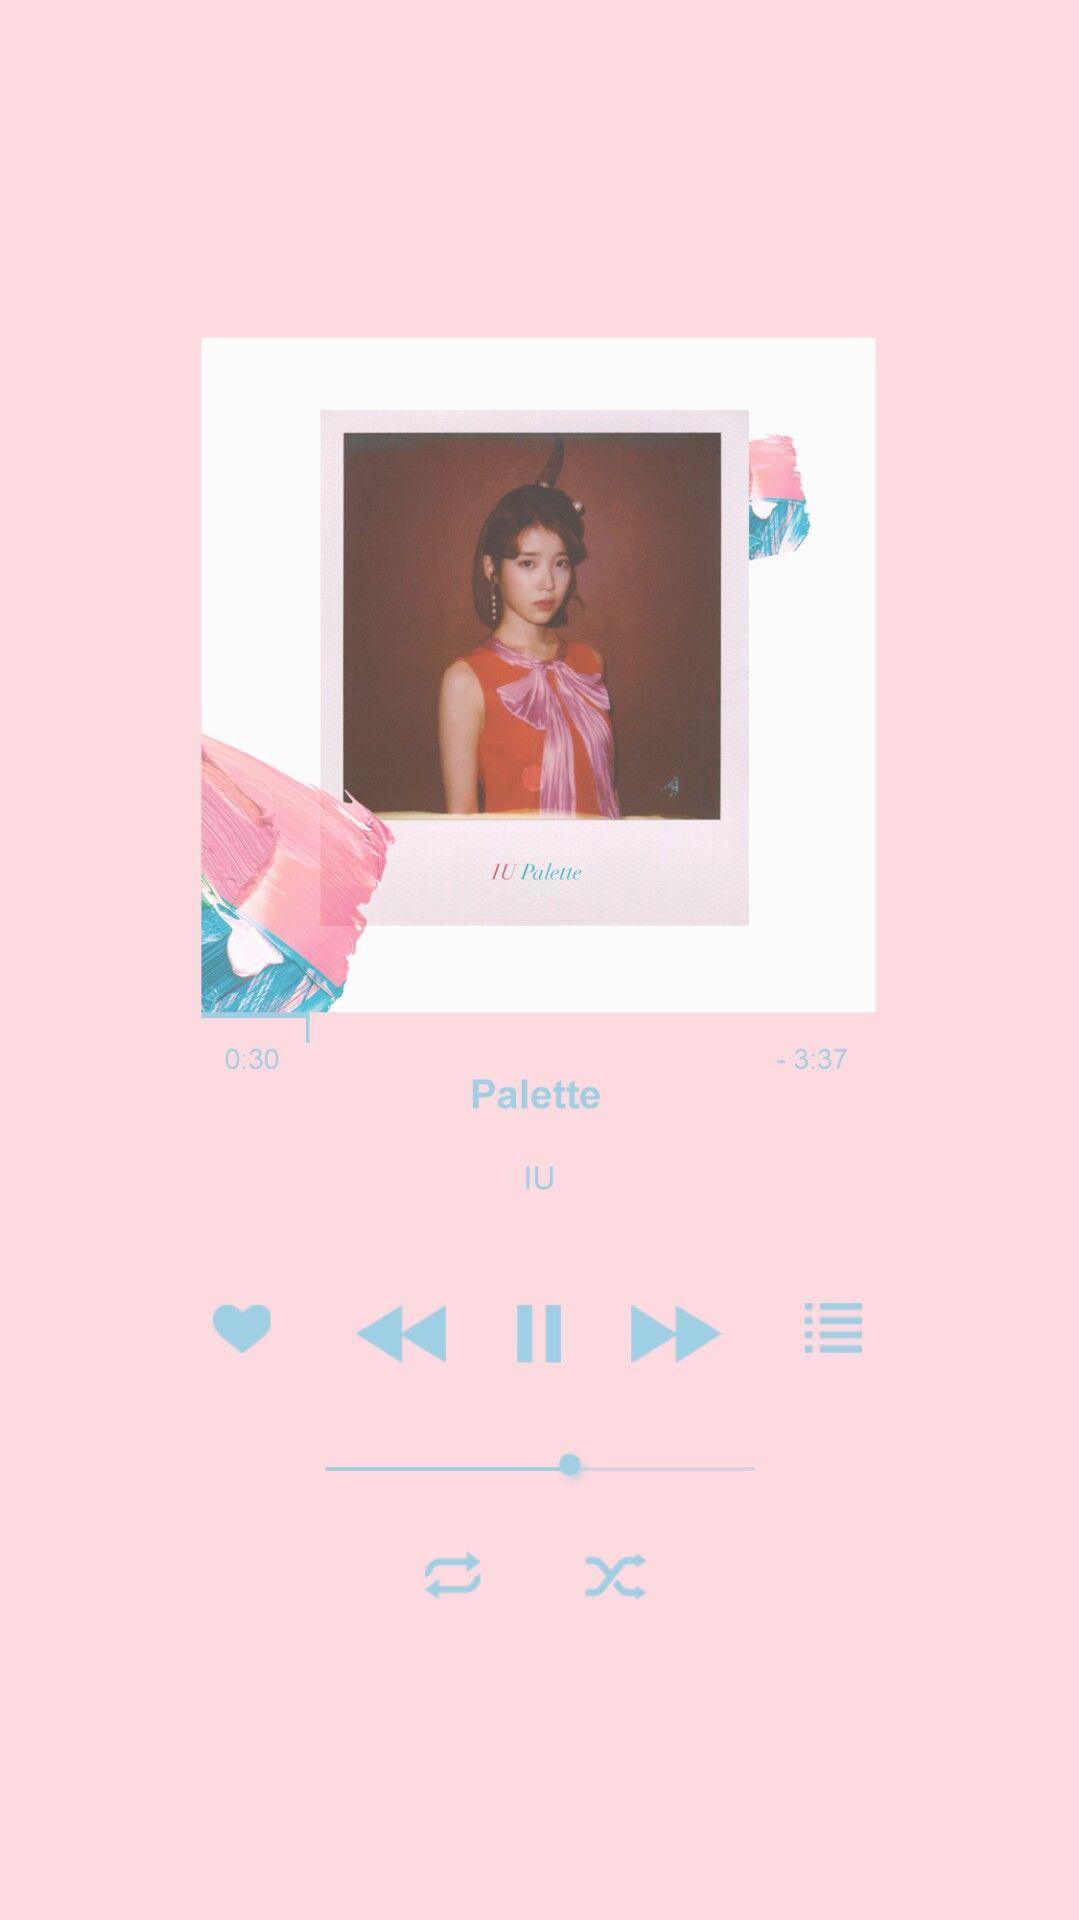 Kpop Aesthetic Iphone Wallpaper Pinterest